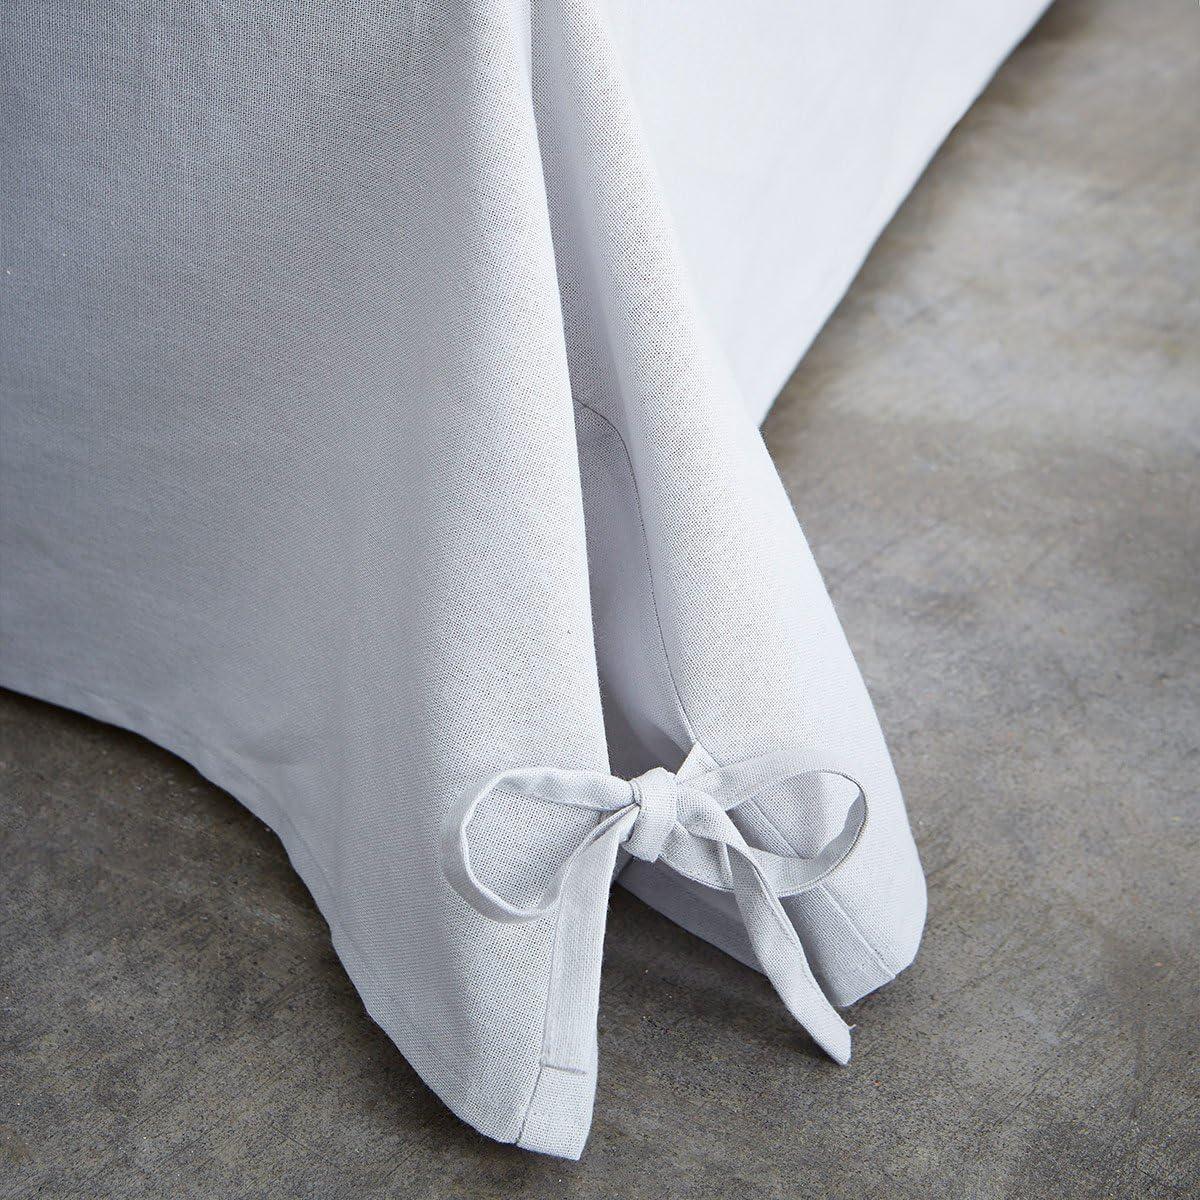 TODAY 576334 Cache - Funda de somier, algodón/Tela Tejida/Polipropileno, algodón, Gris Zinc, 140x190 cm